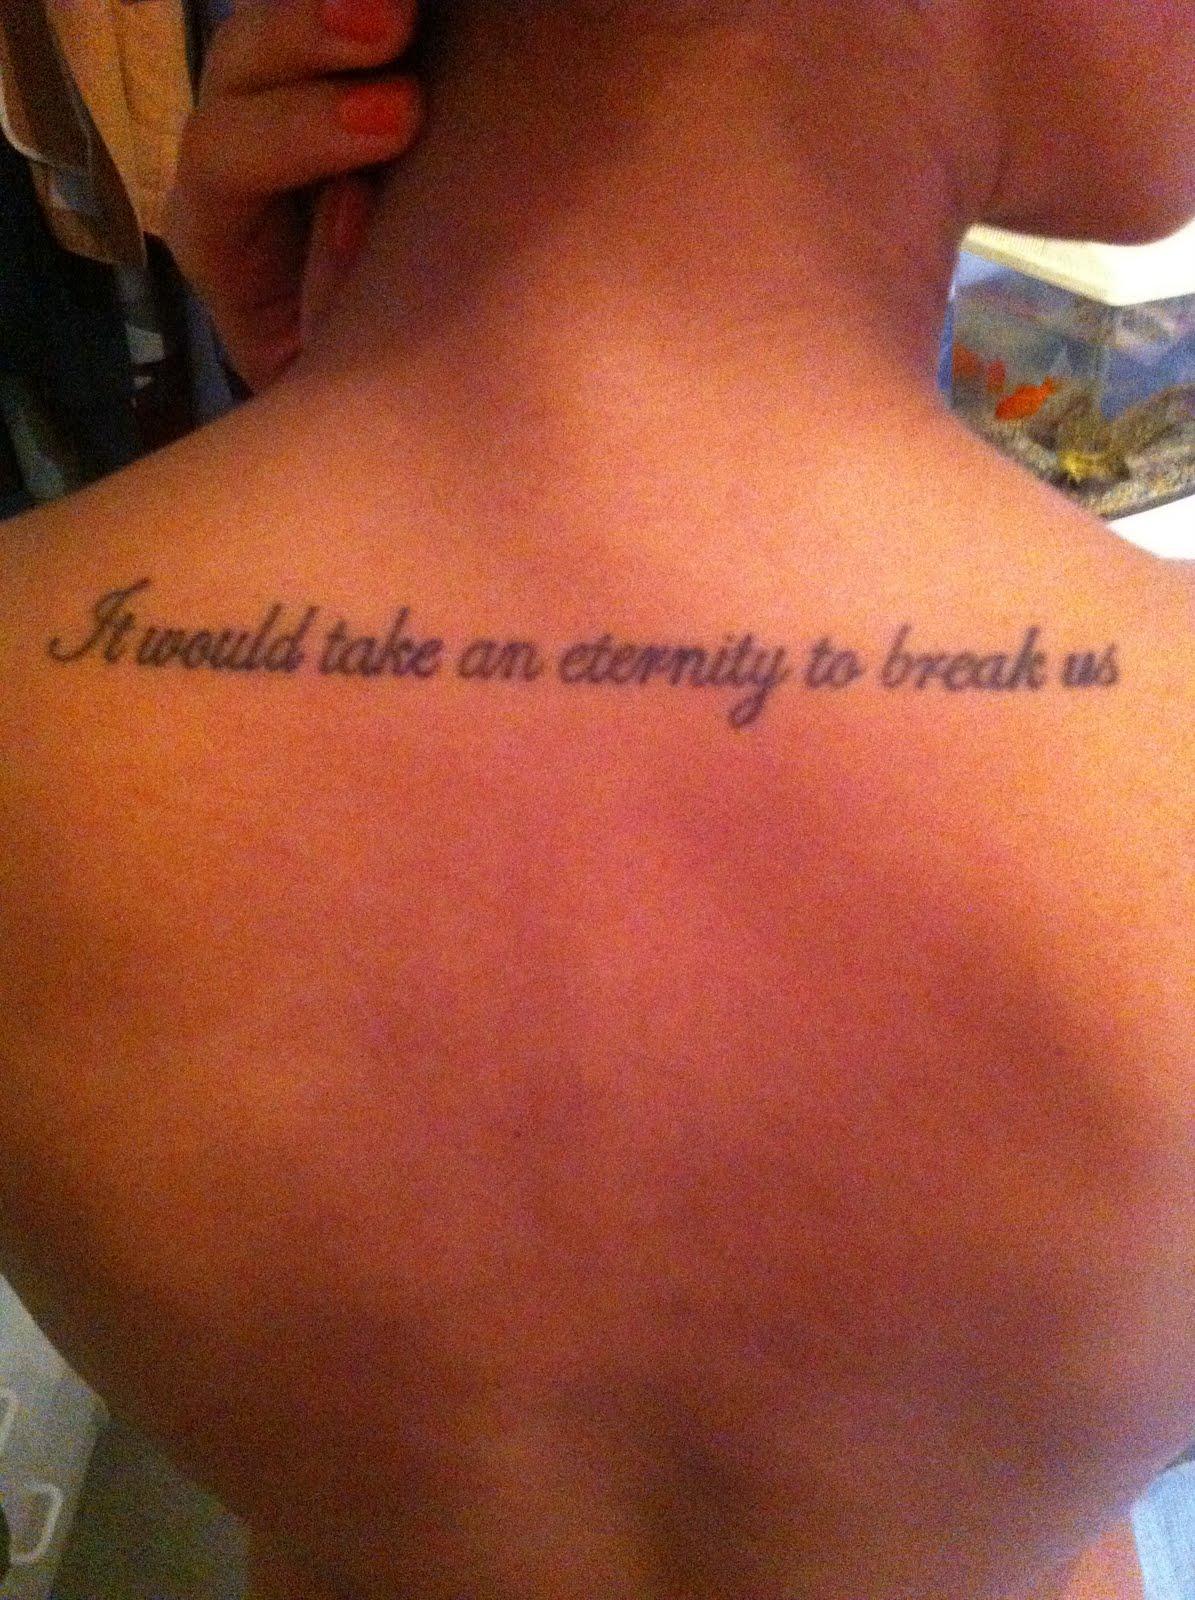 queen lyrics tattoo - photo #4